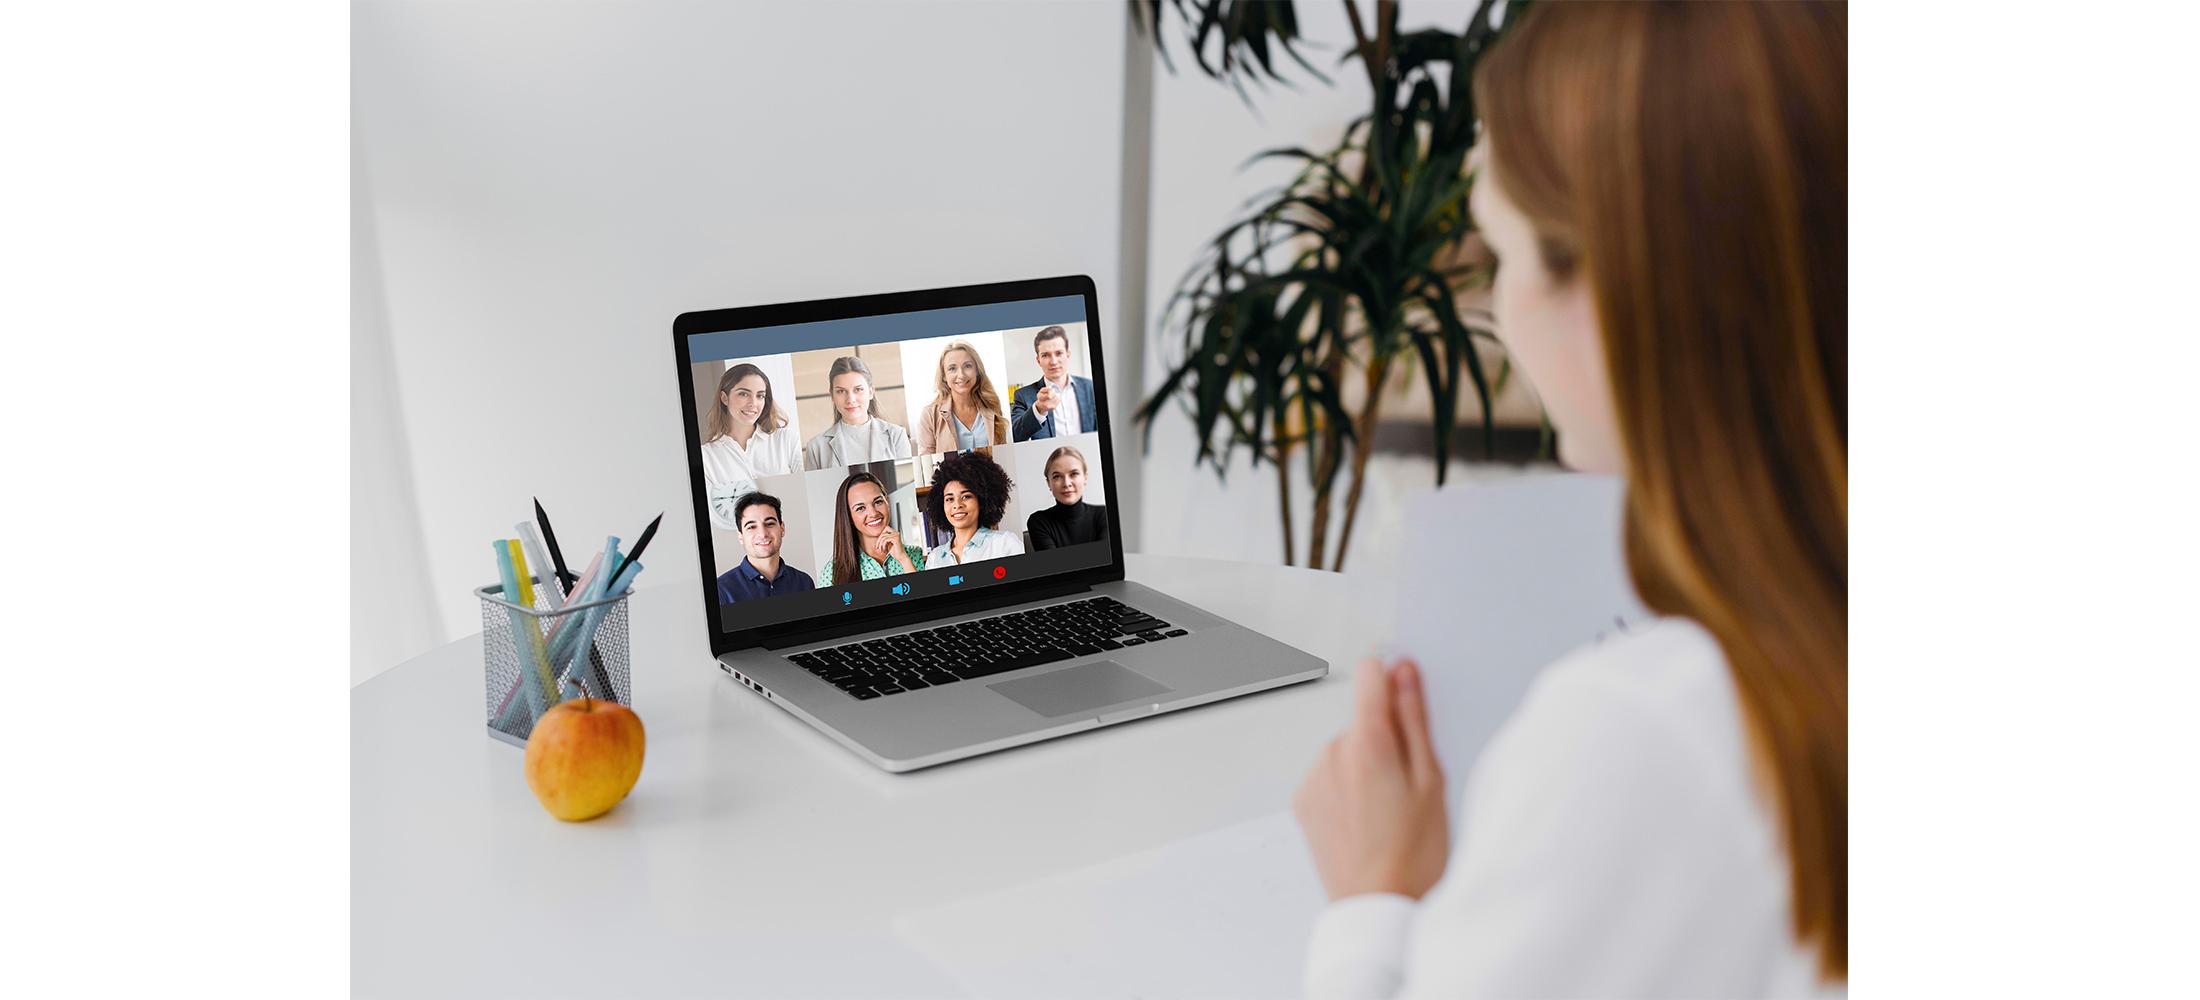 Manage employees remotely